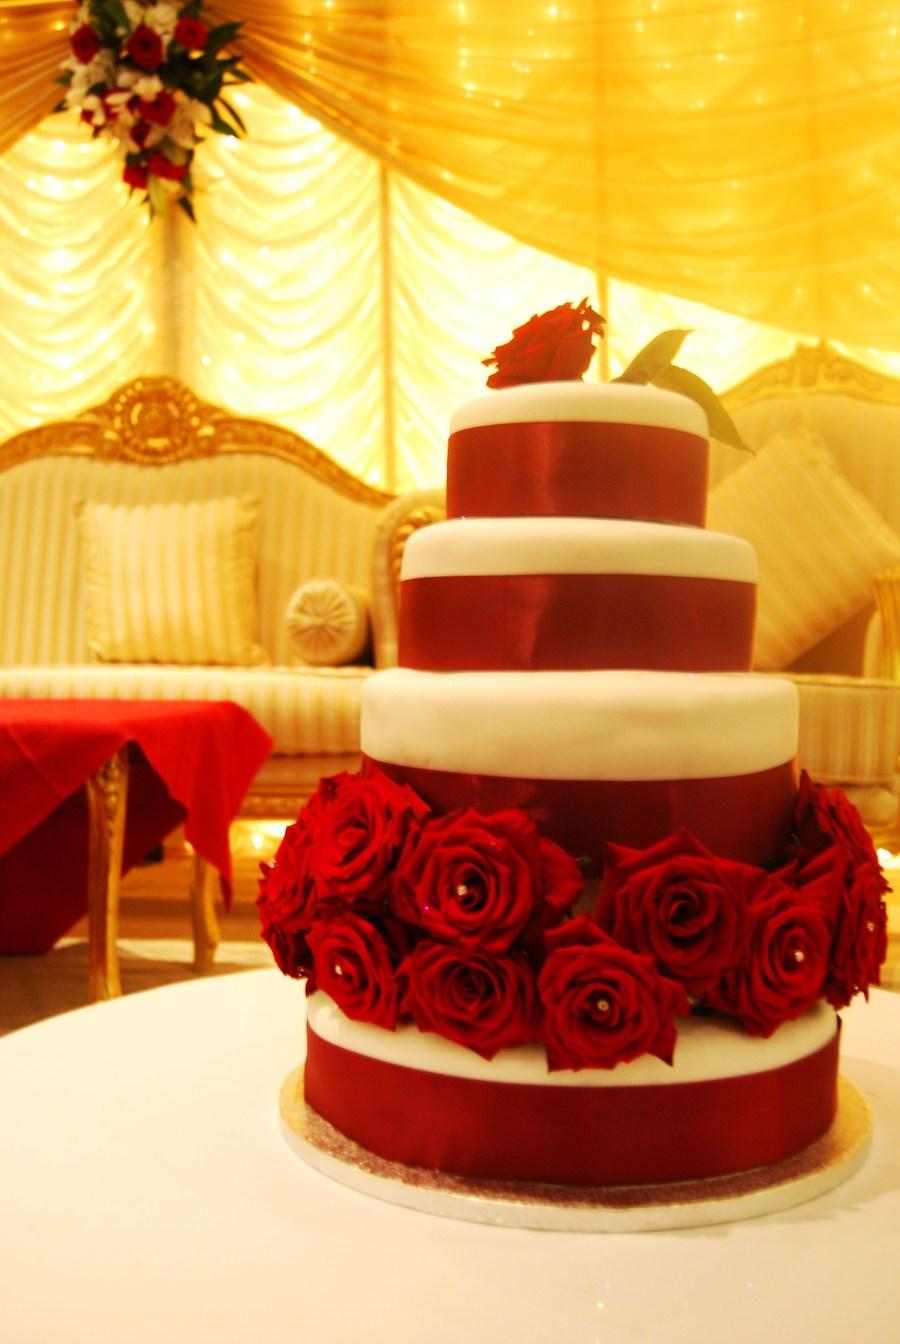 Red&white Rose Wedding Cake - CakeCentral.com